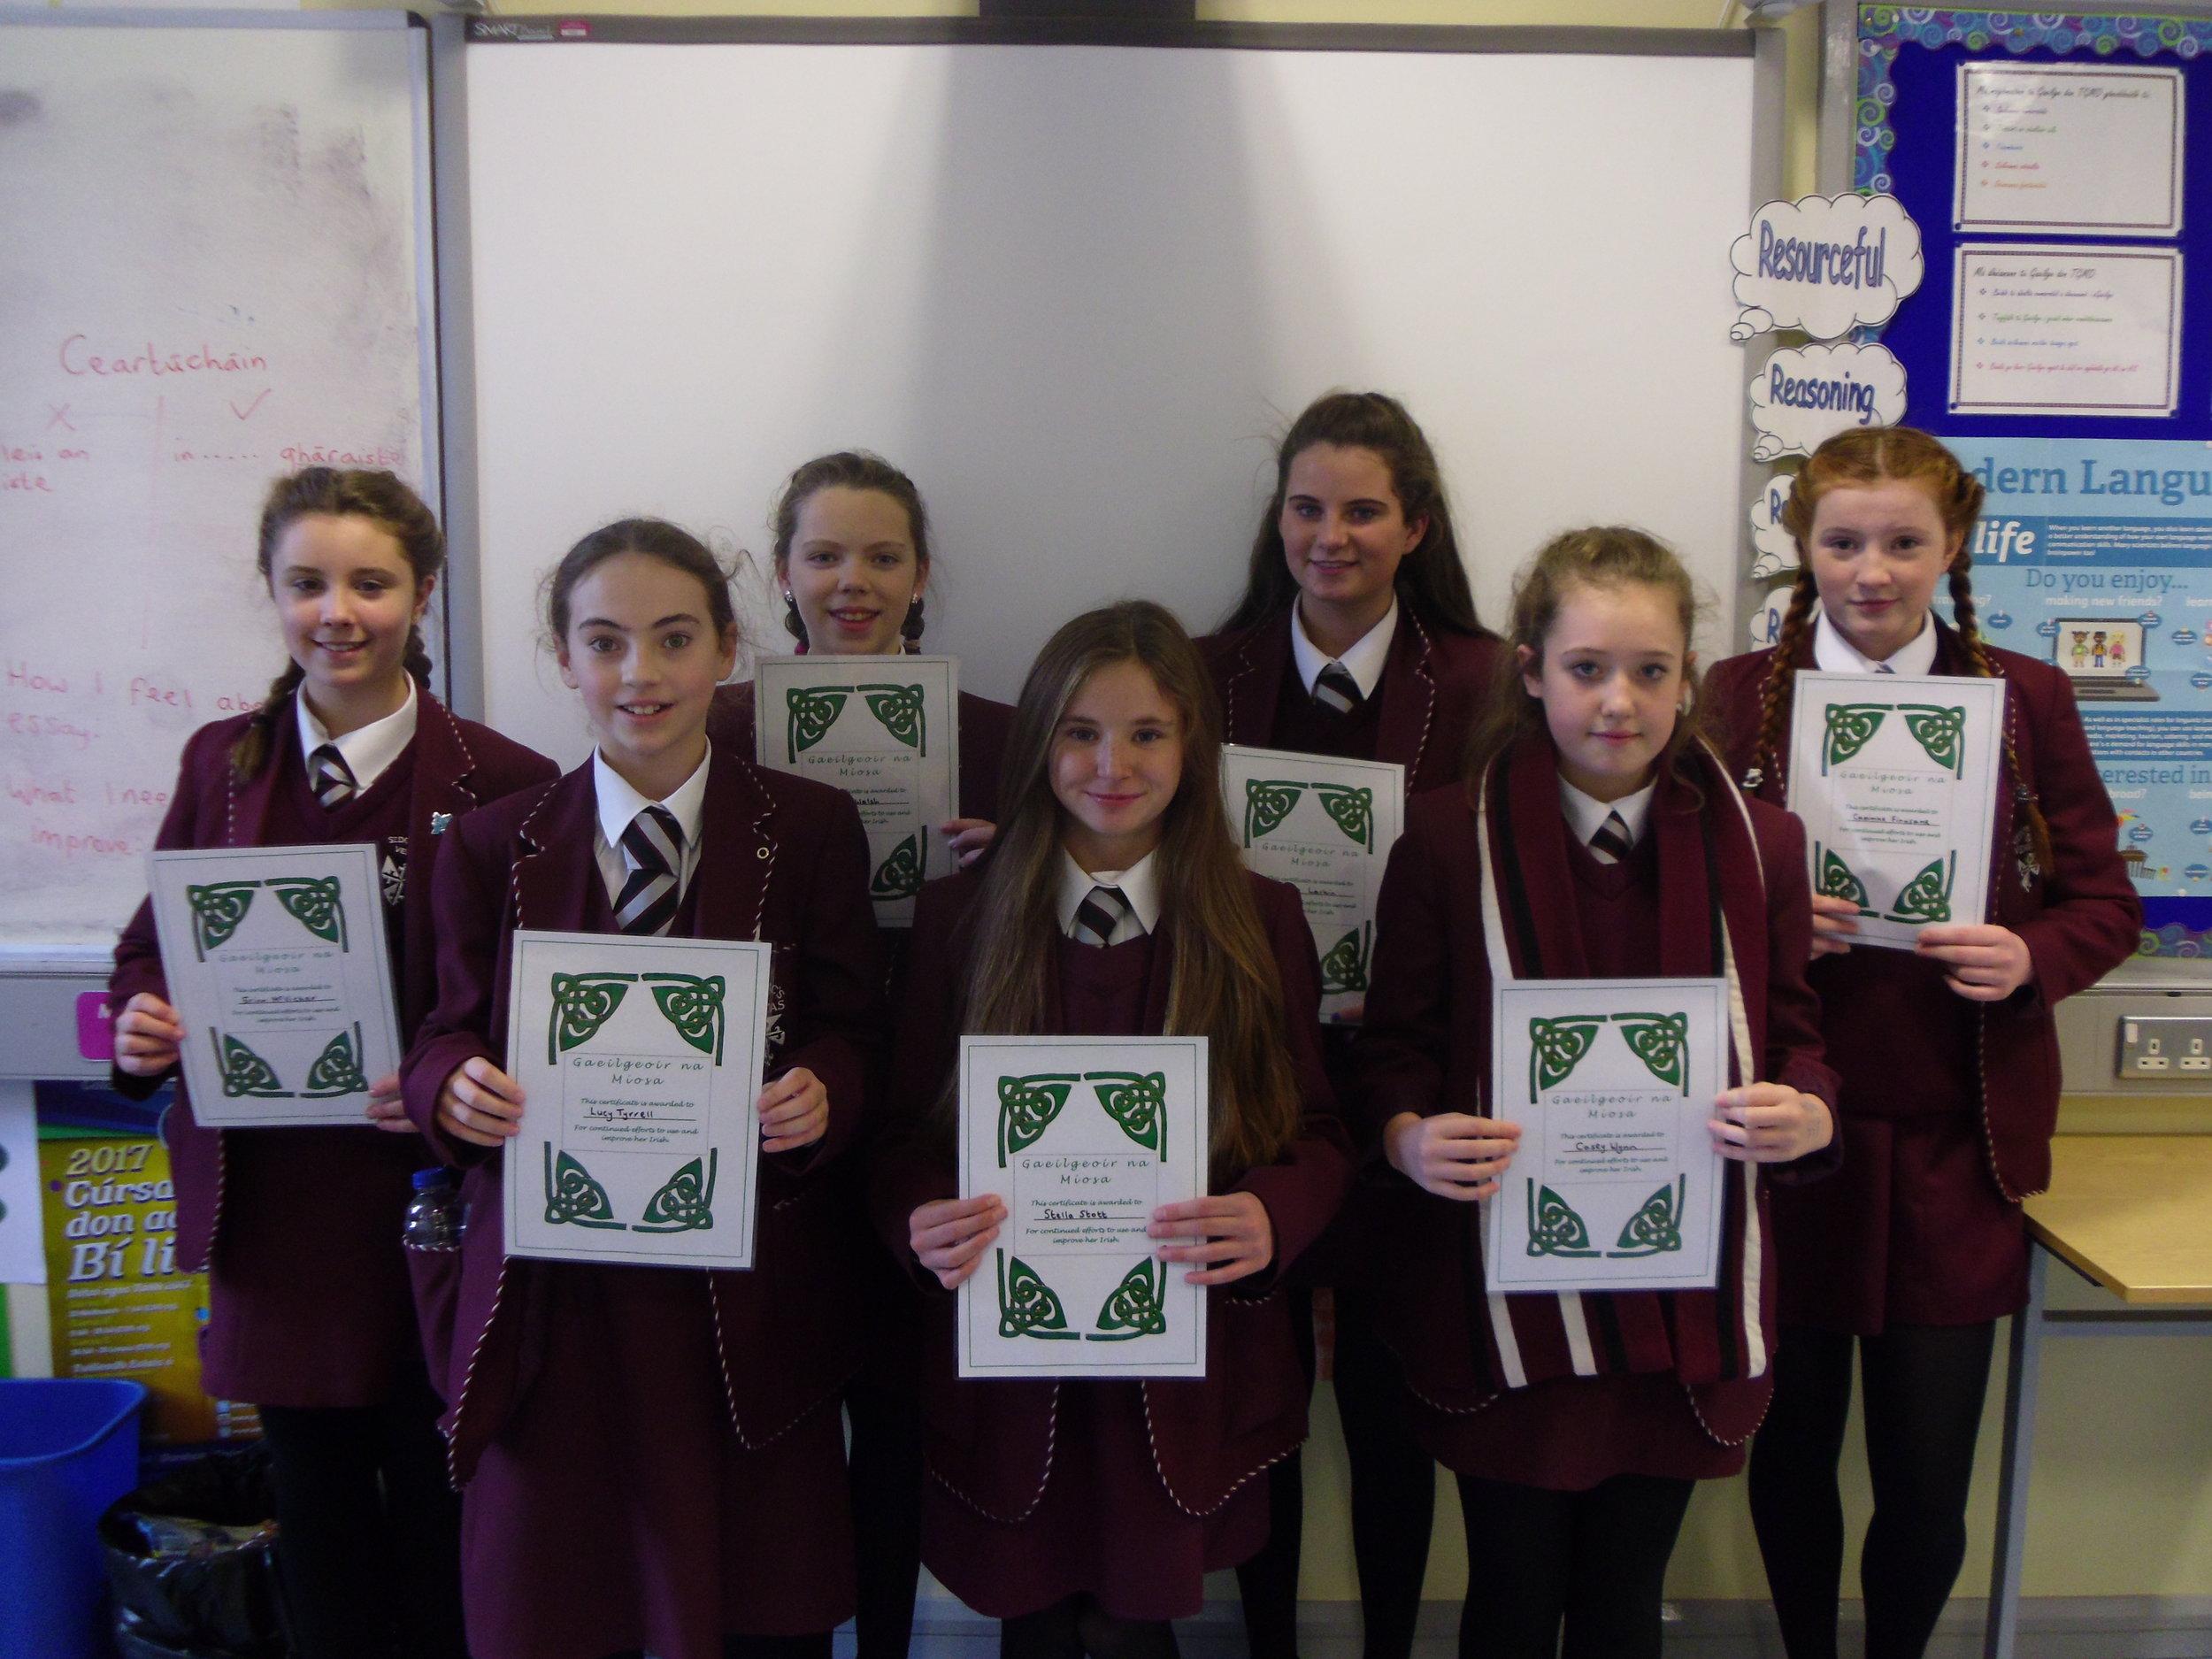 Gaeilgeoir na Míosa certificate winners